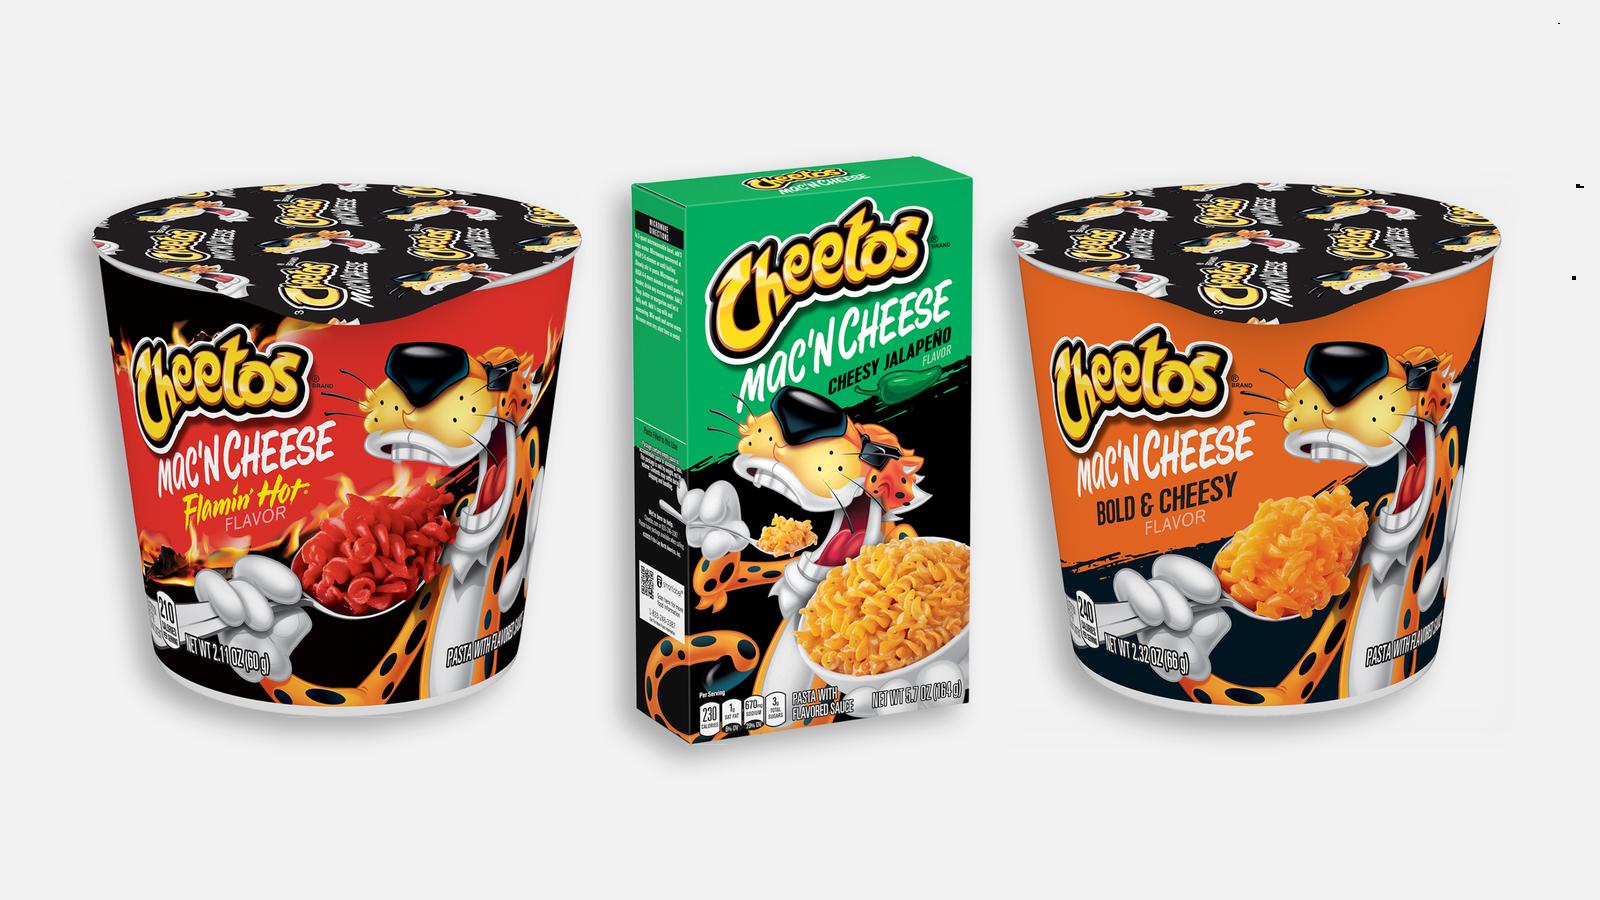 Cheetos Mac 'n' Cheese comes in three flavors — Bold & Cheesy, Flamin' Hot and Cheesy Jalapeño. (Frito-Lay/Quaker Foods)